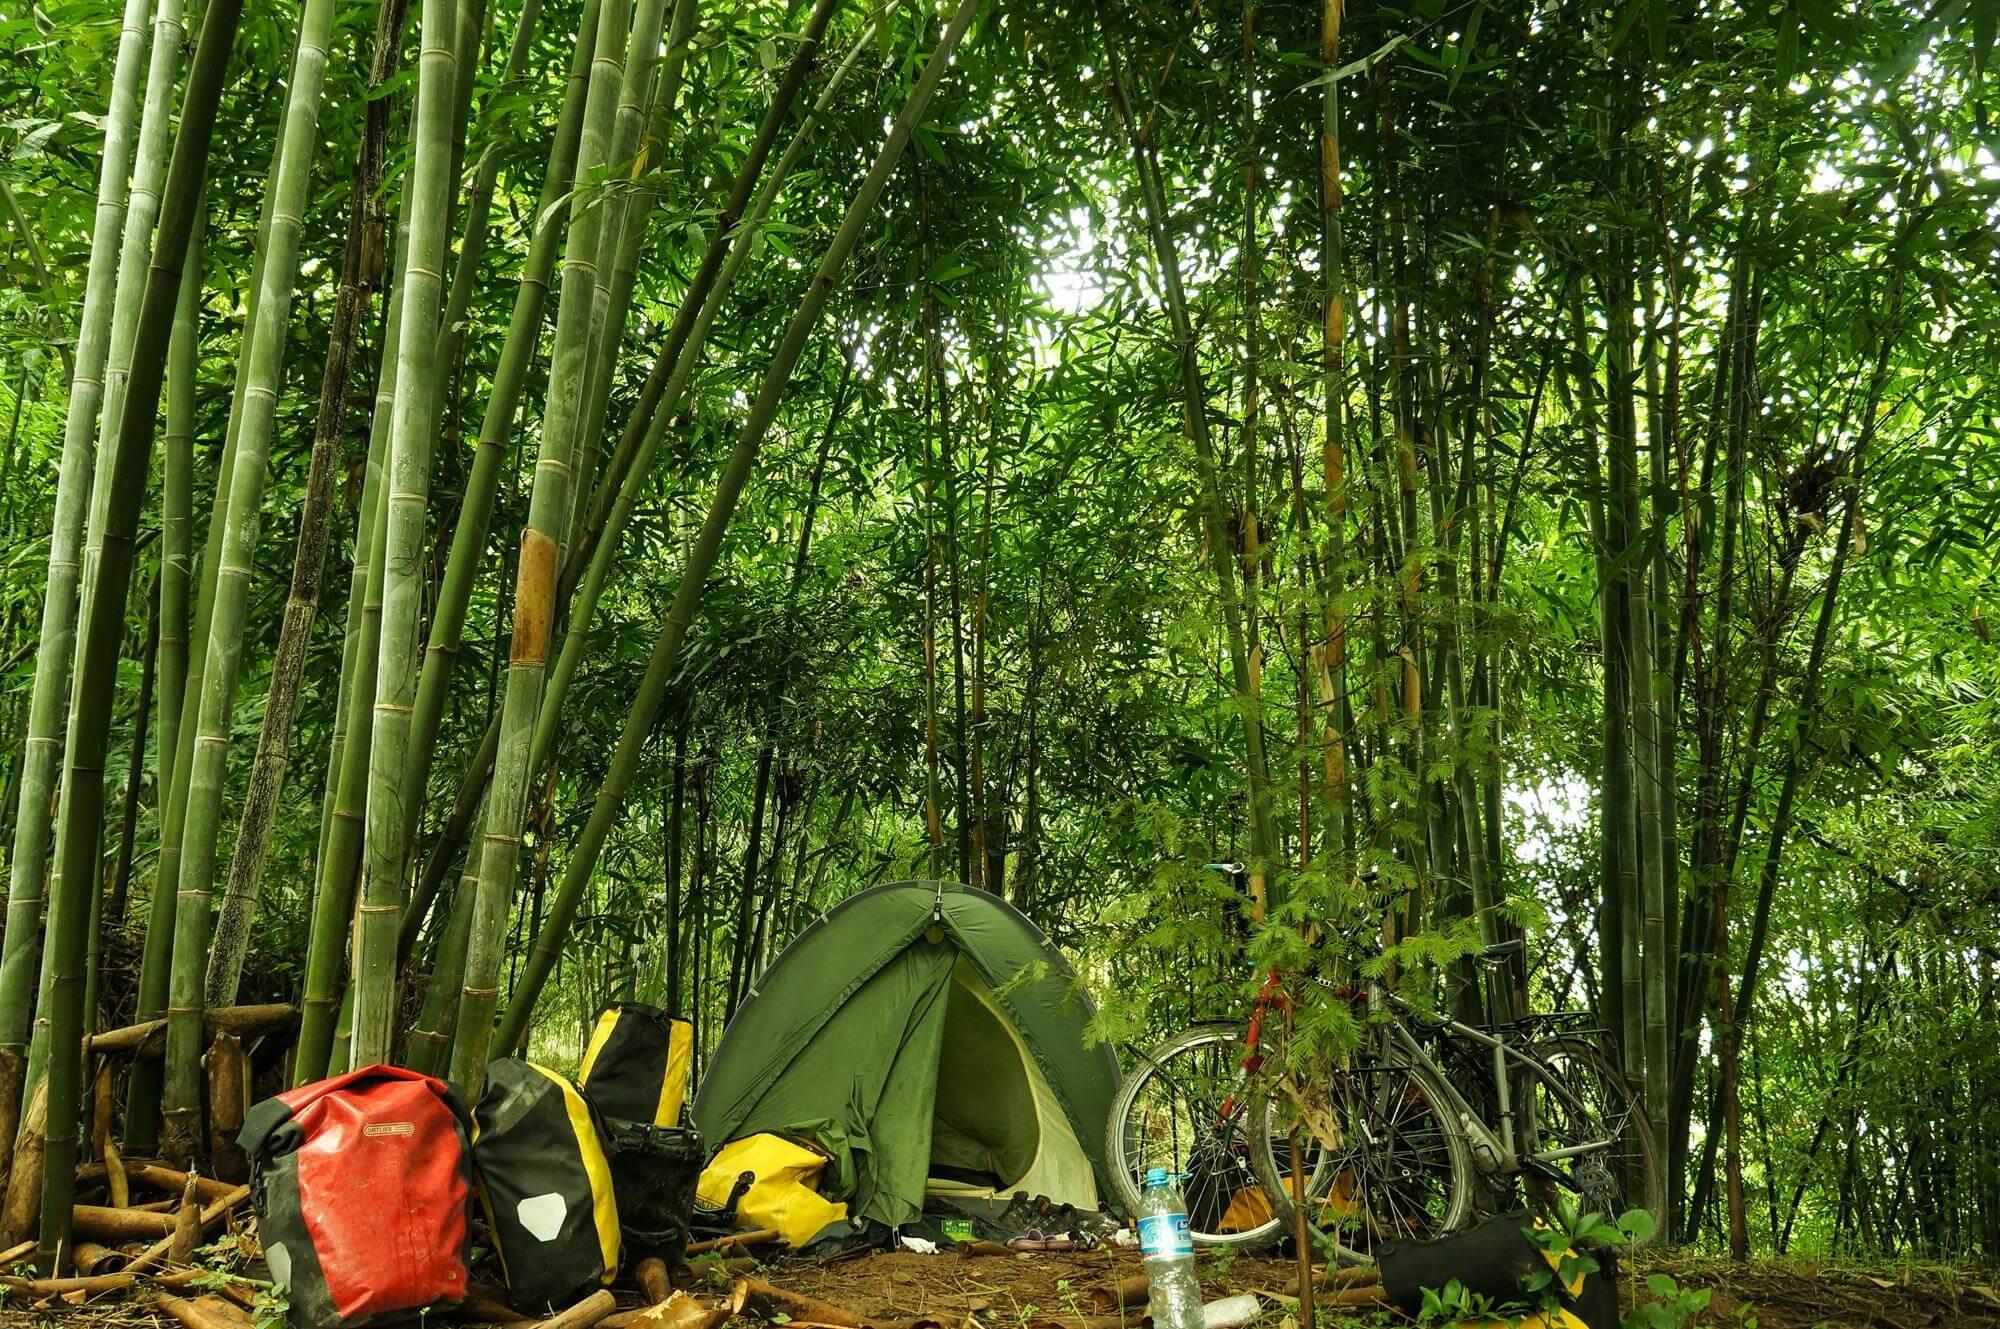 namiot Vaude Taurus Chiny bambusowy las